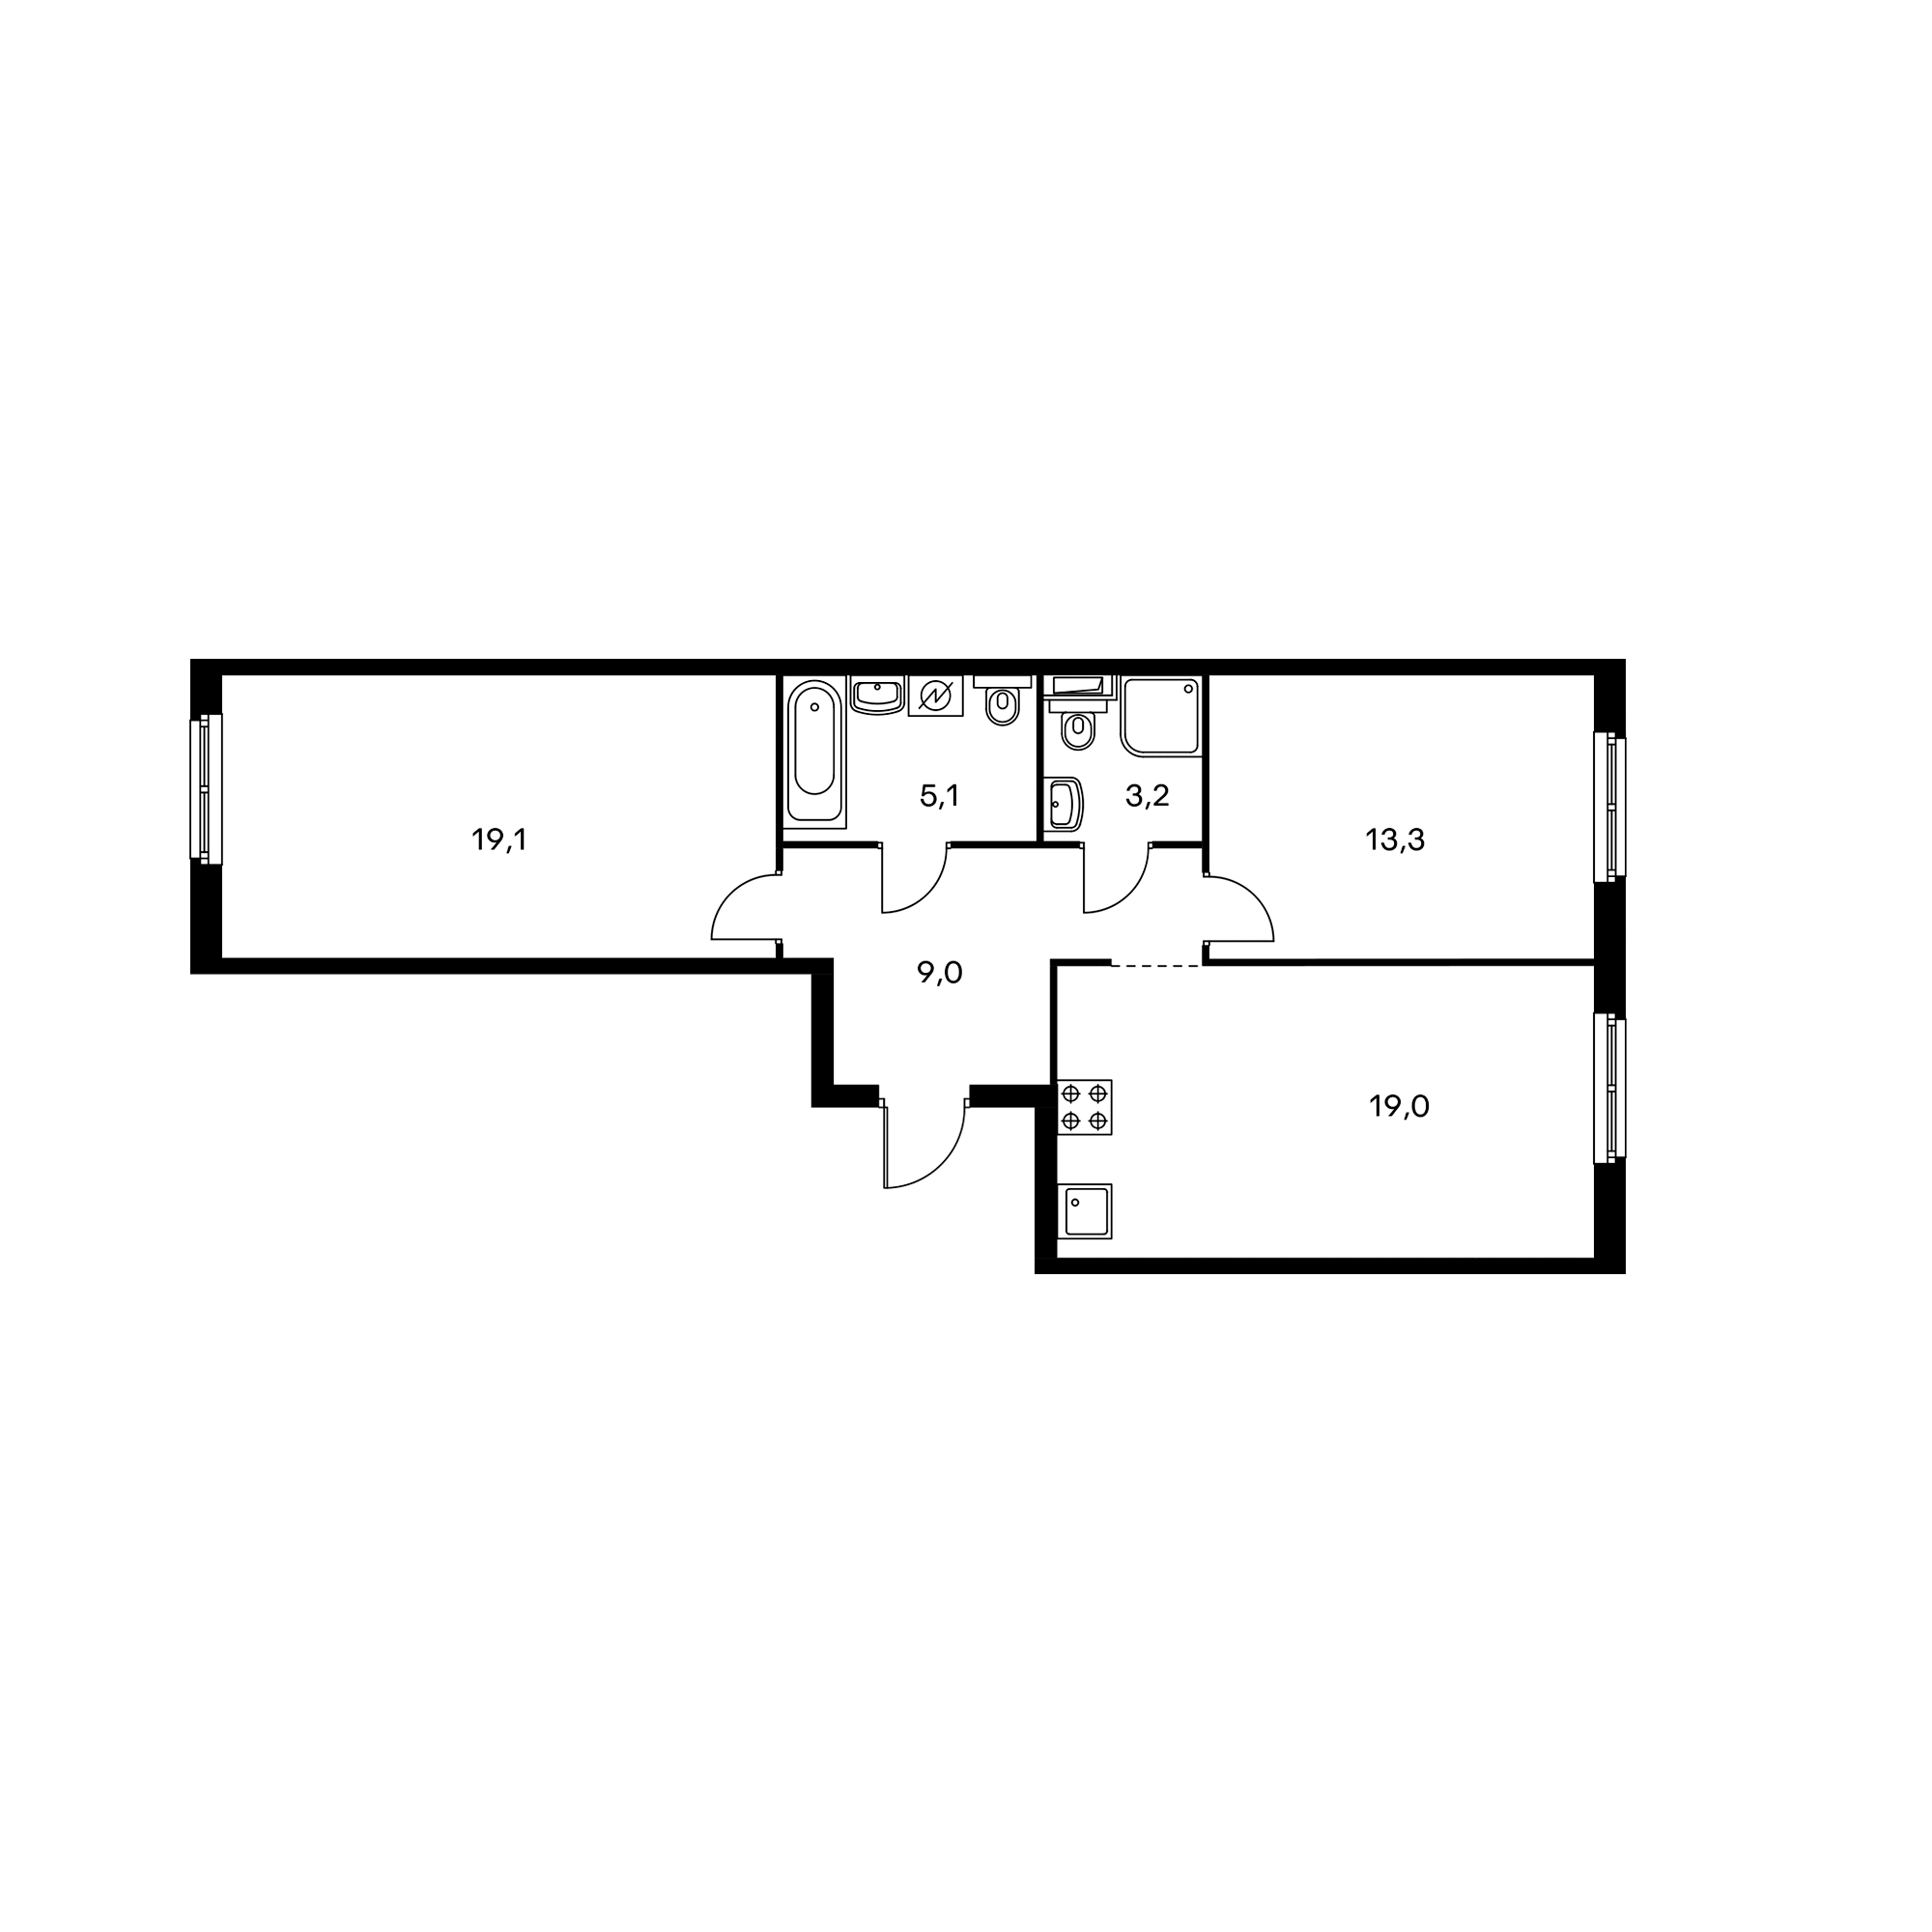 2EL3_6.6